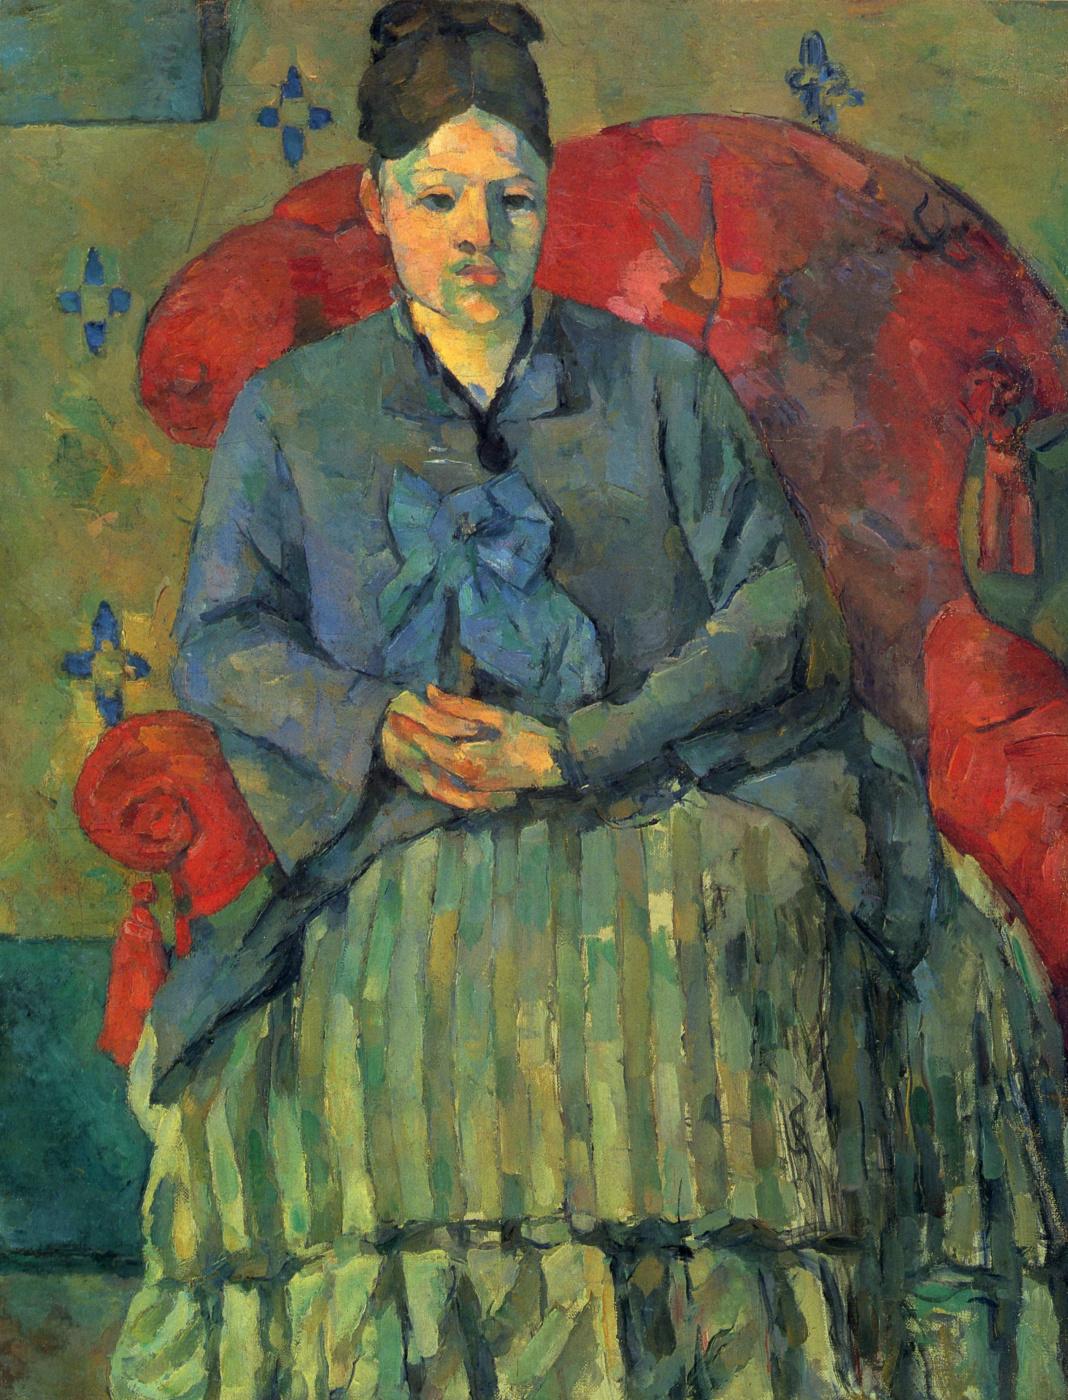 Paul Cezanne. Madame Cezanne in a red armchair